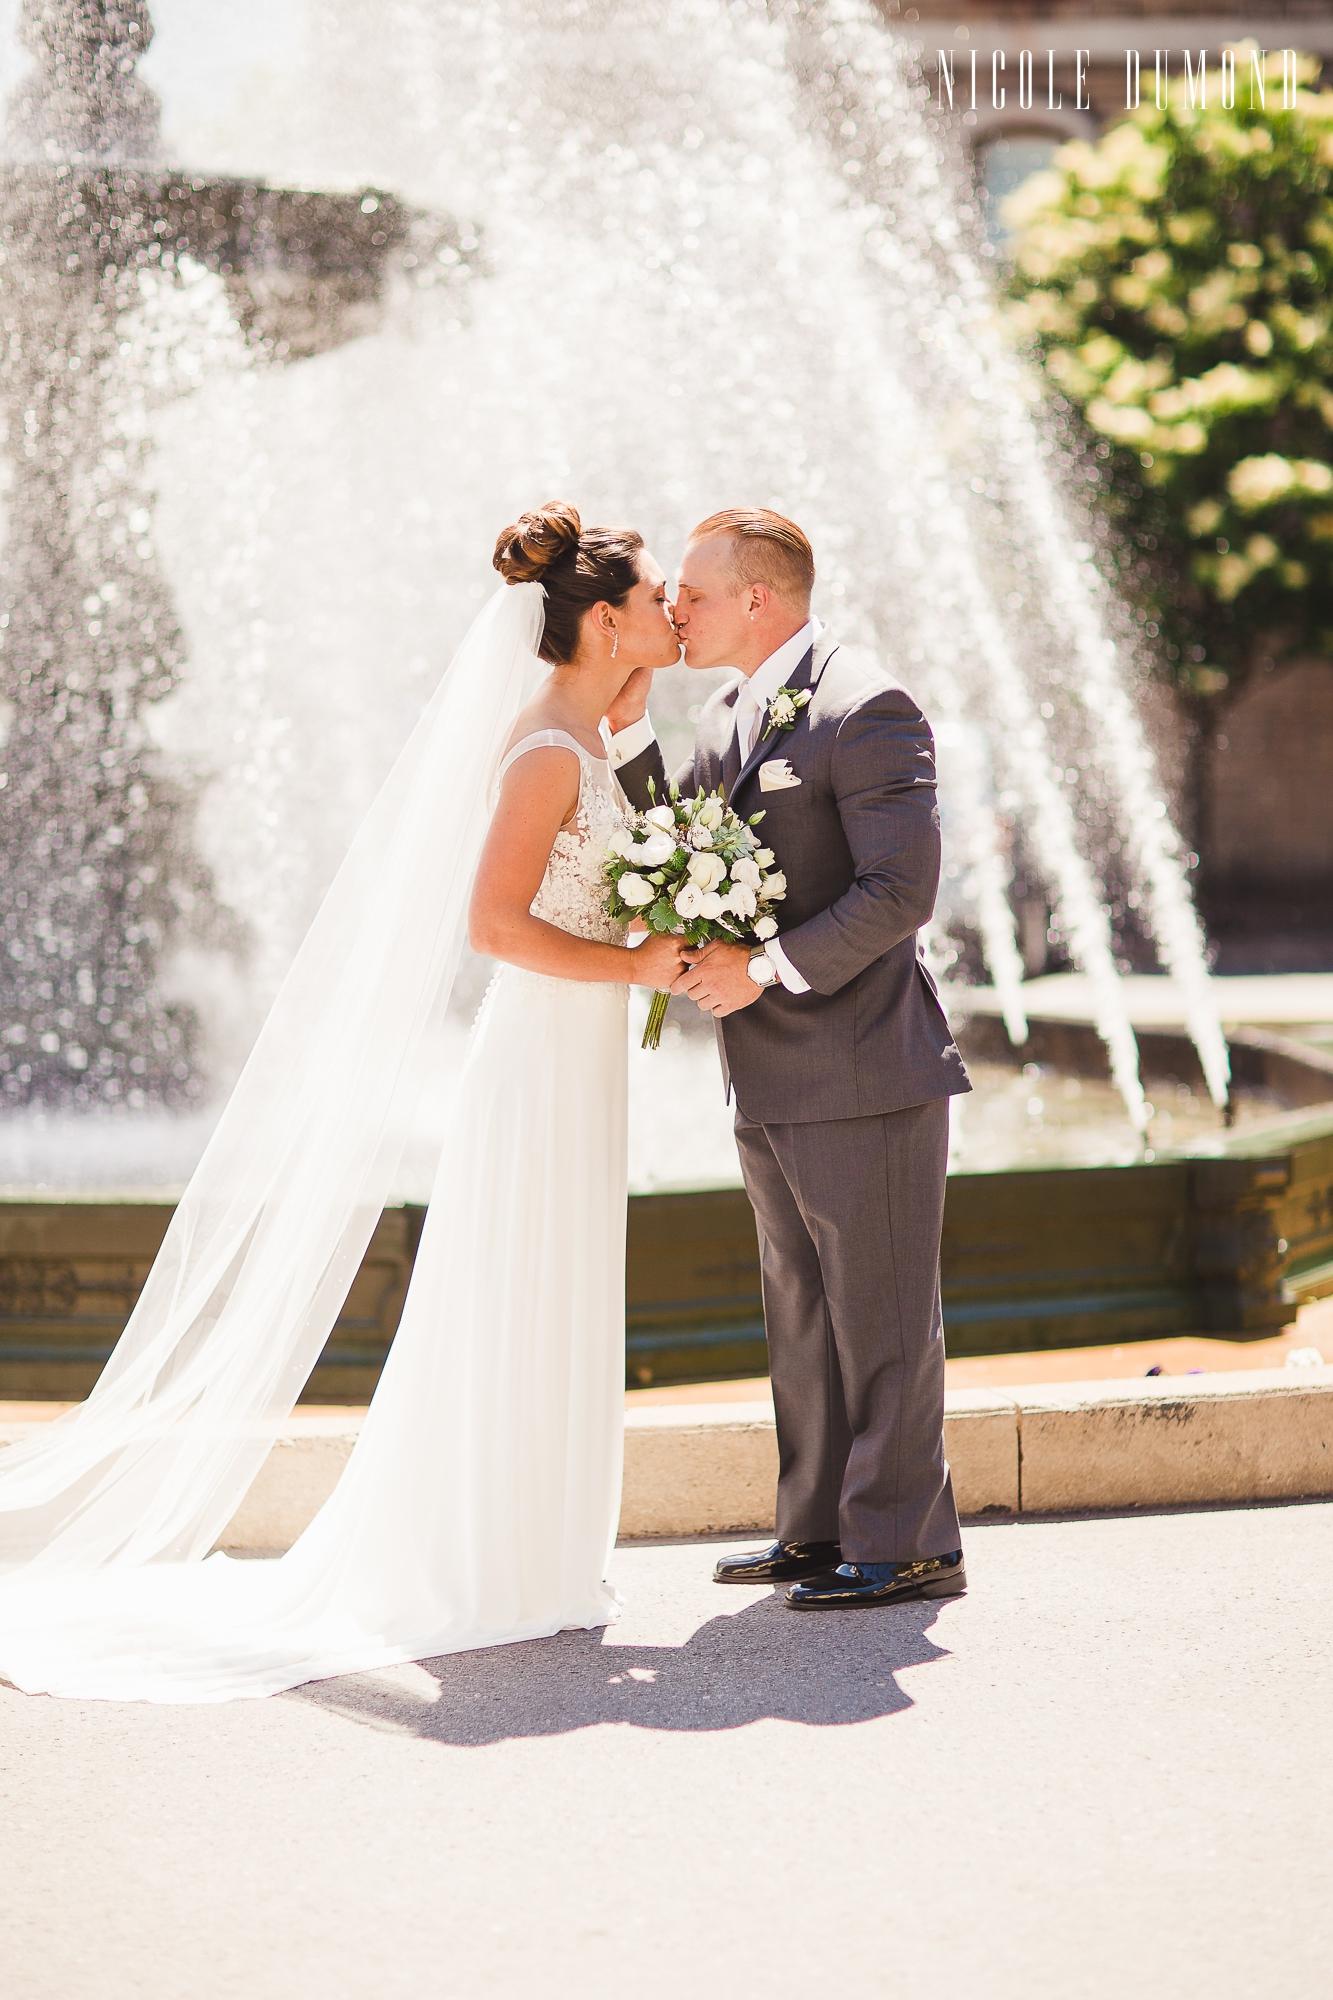 Frosty-valley-danville-wedding-4